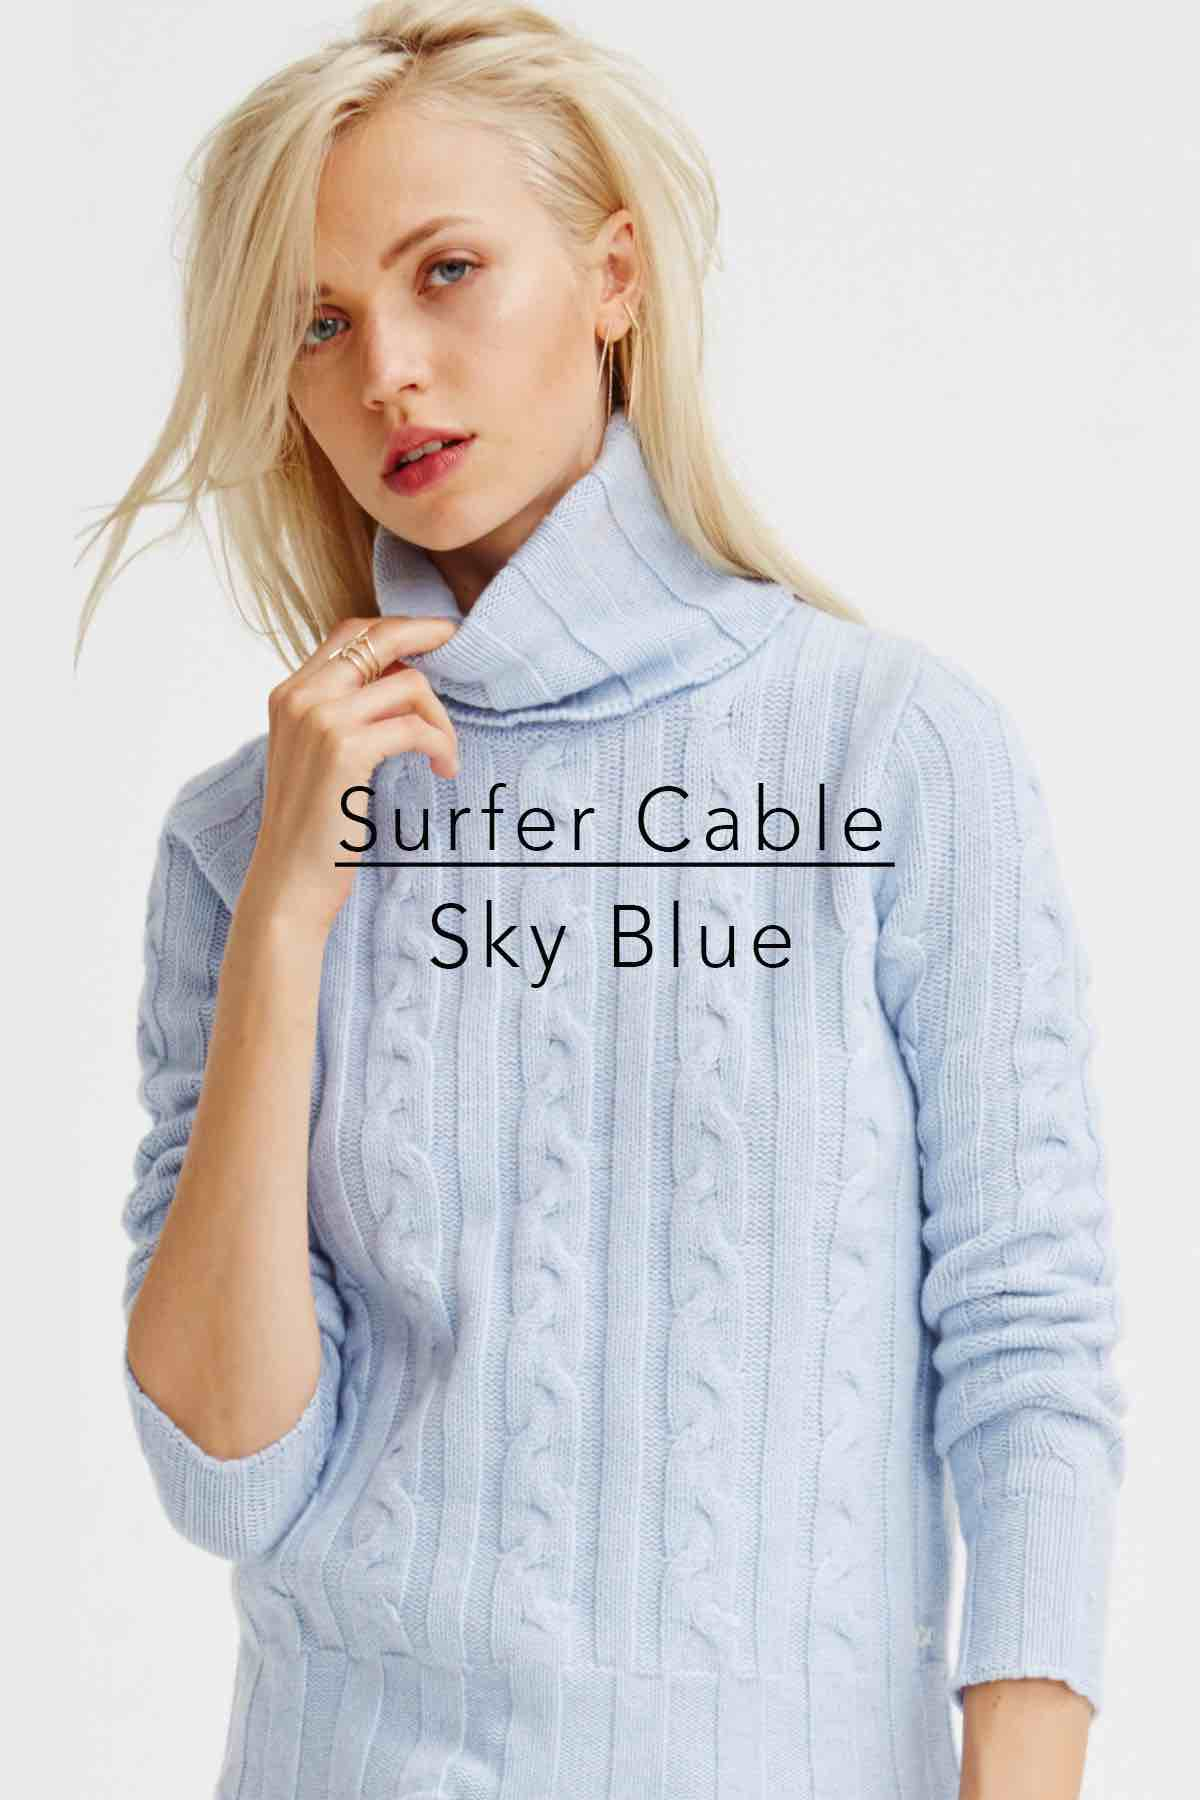 Surfer Cable Sky Blue